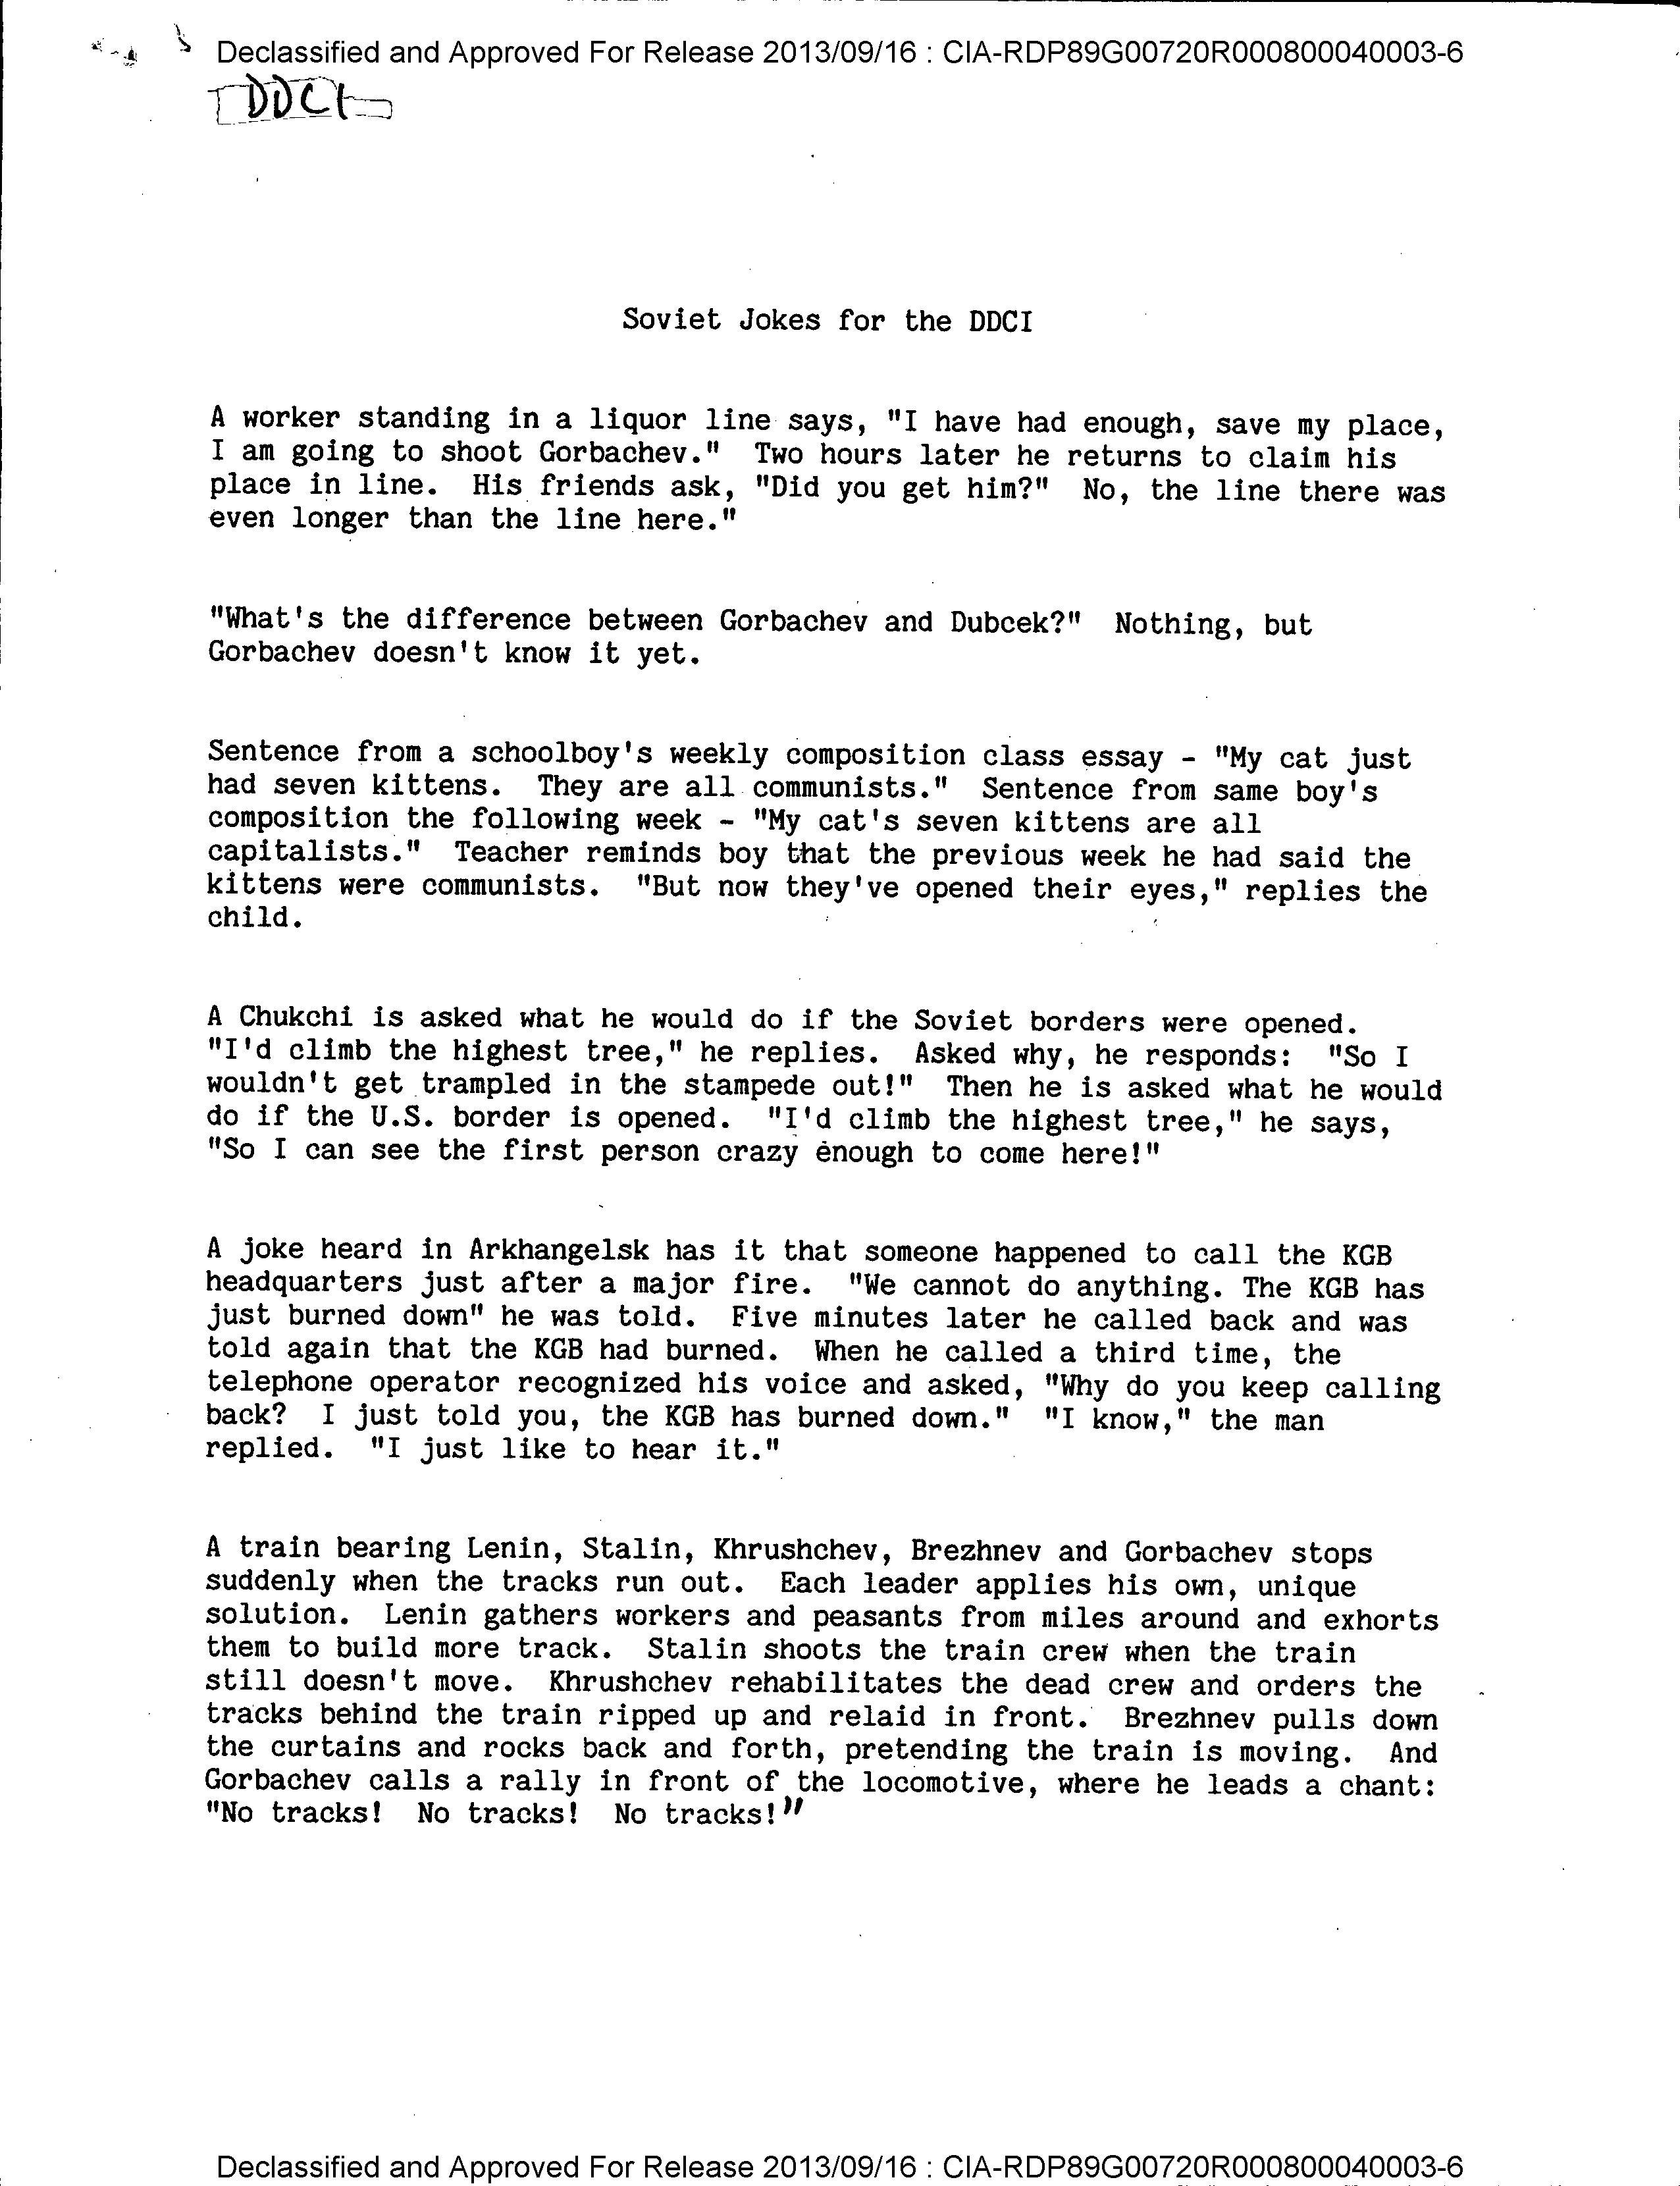 Declassified CIA Soviet jokes offer a glimpse of Cold War humor — Quartz